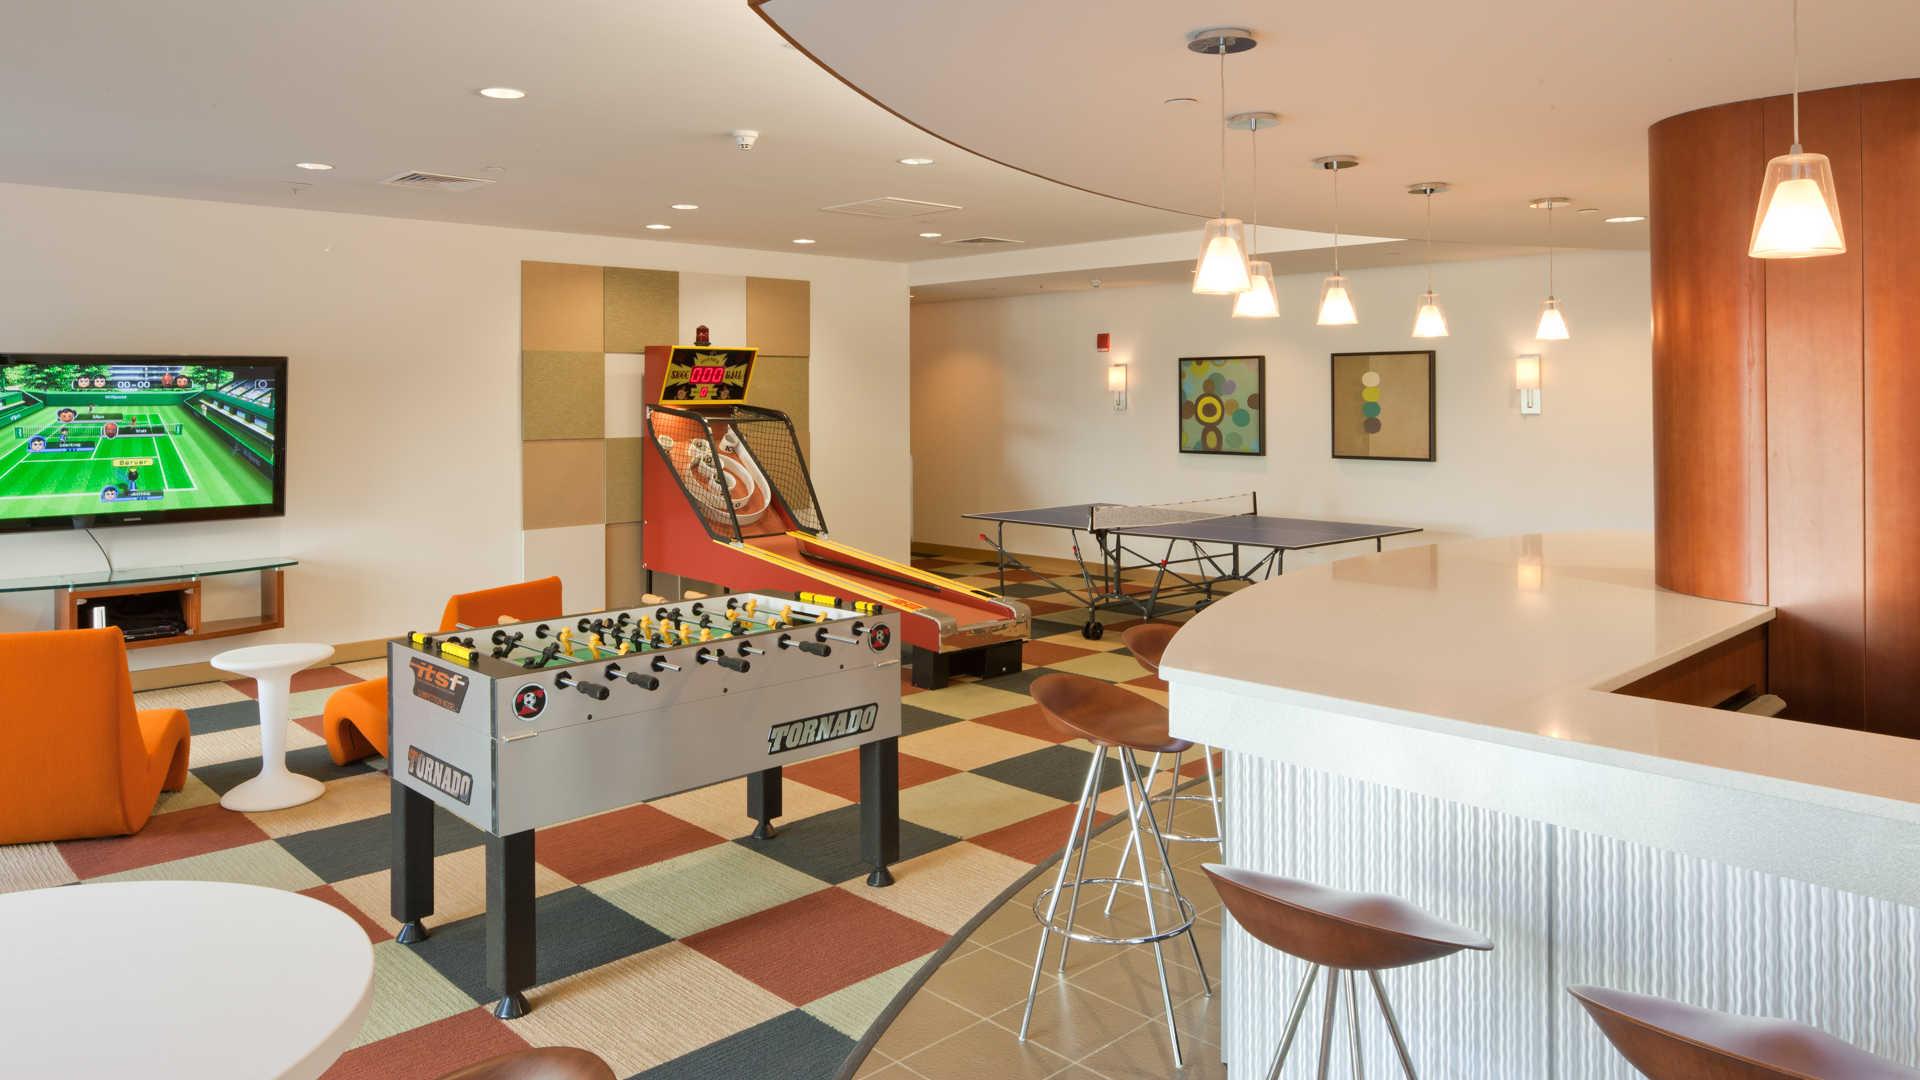 Third square apartments game room